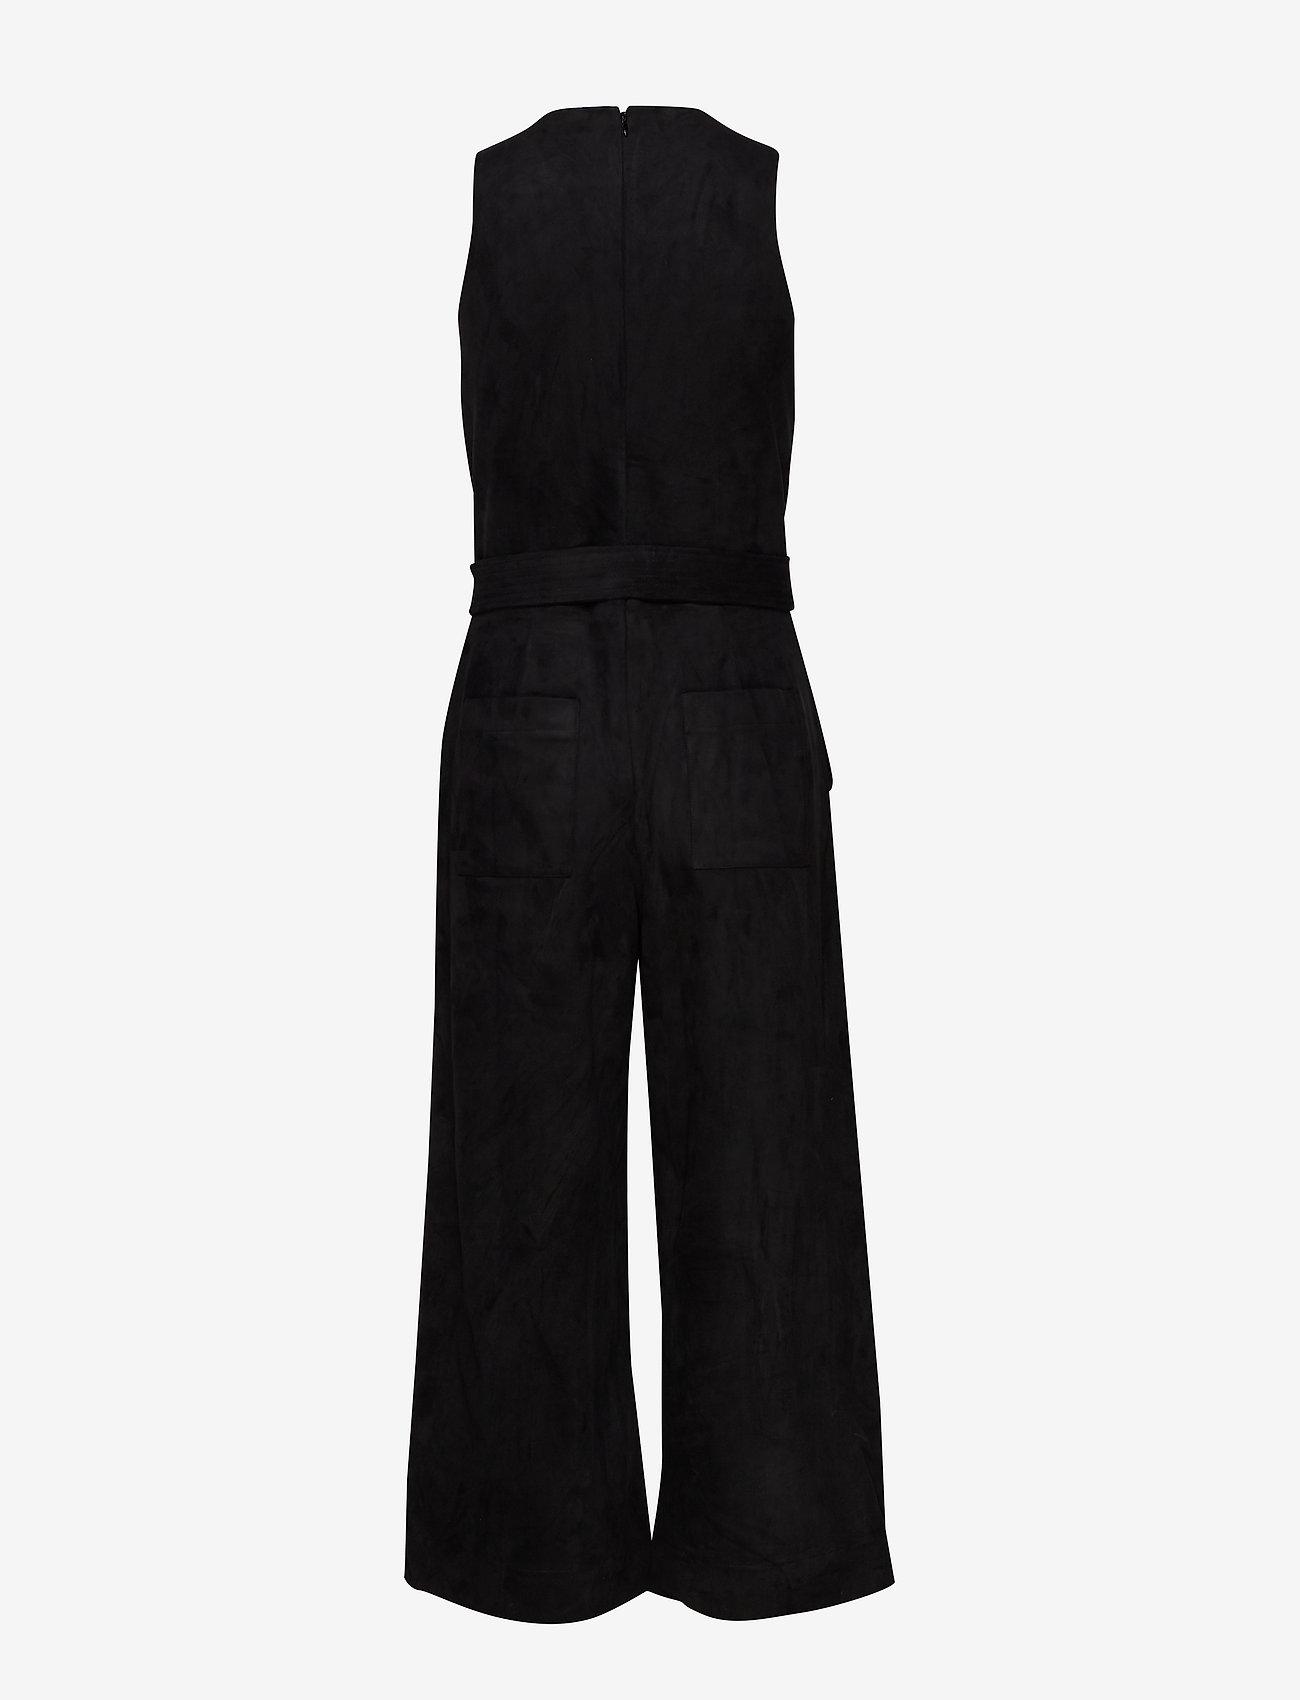 Vegan Suede Cropped Wide-leg Jumpsuit (Black K-100) - Banana Republic eZBeeE